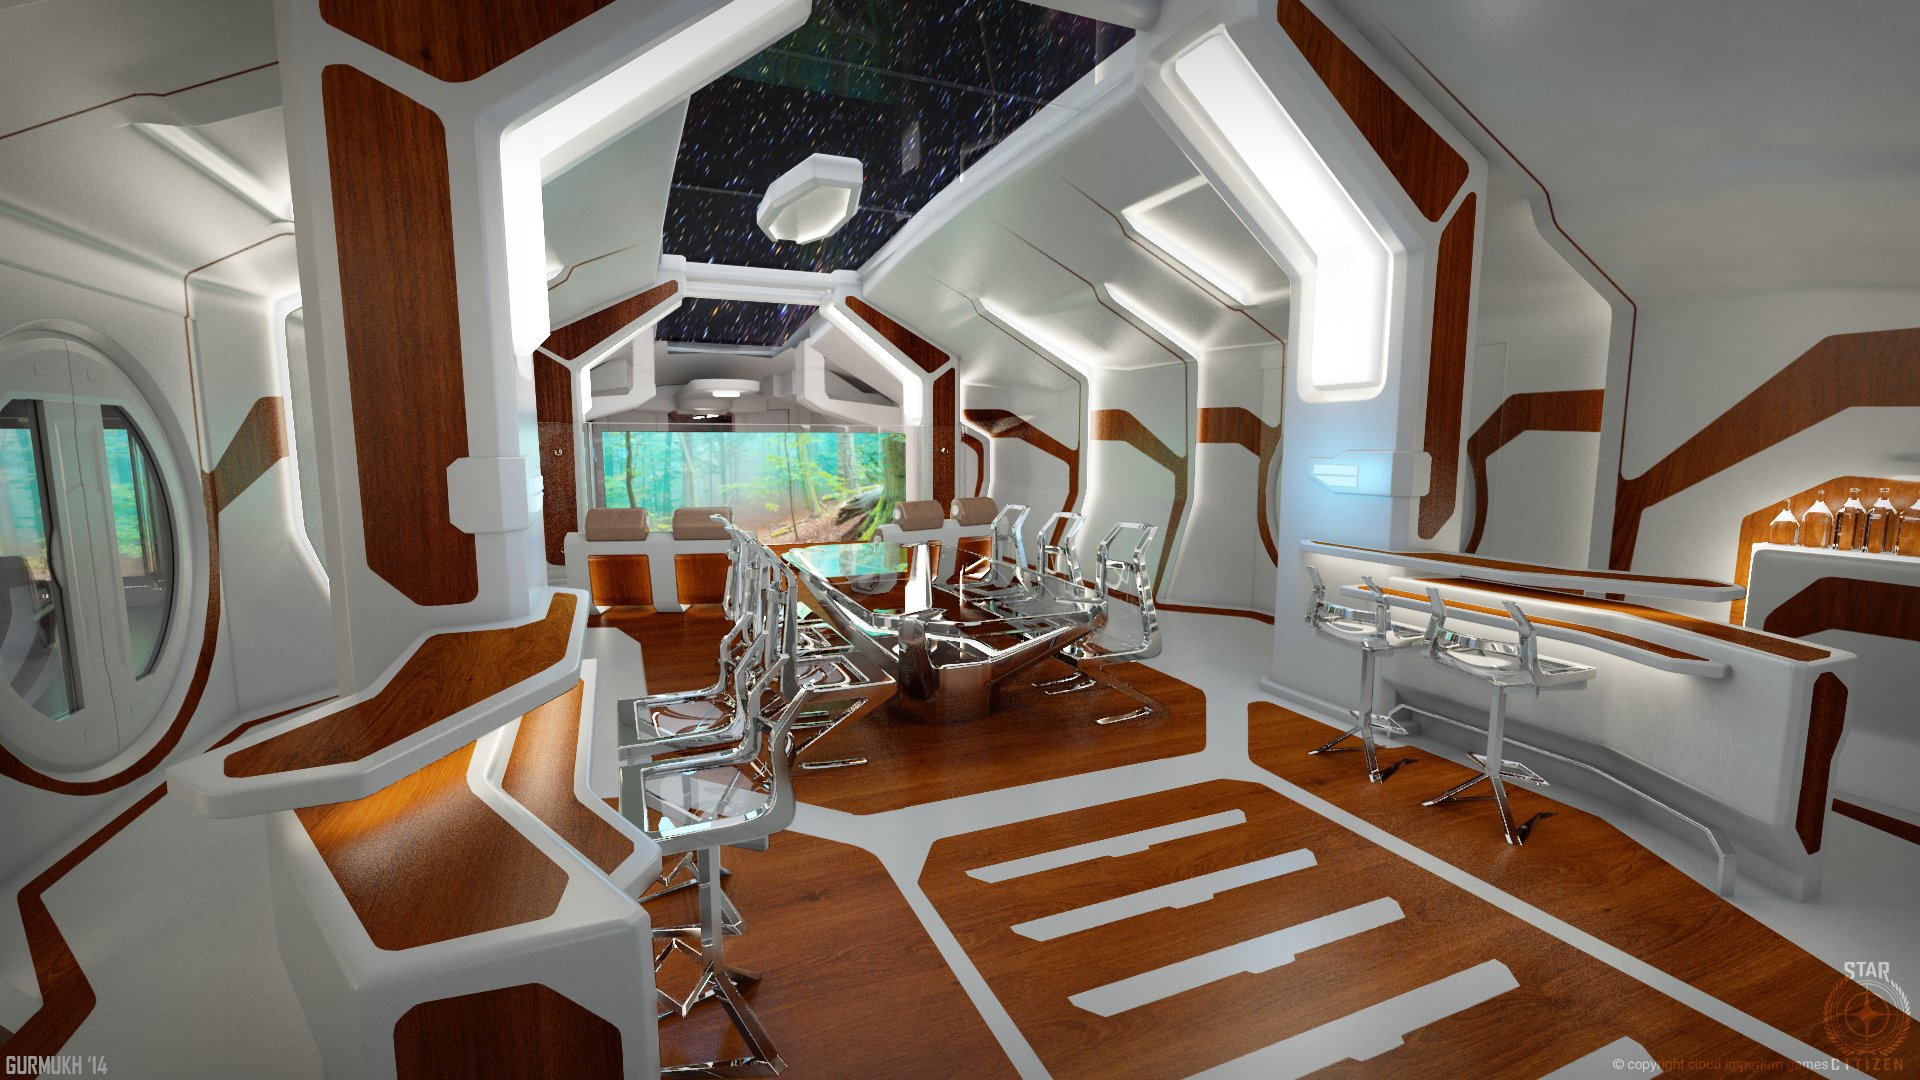 Gurmukh bhasin 1 constellation phoenix int mian cabin bhasin 01